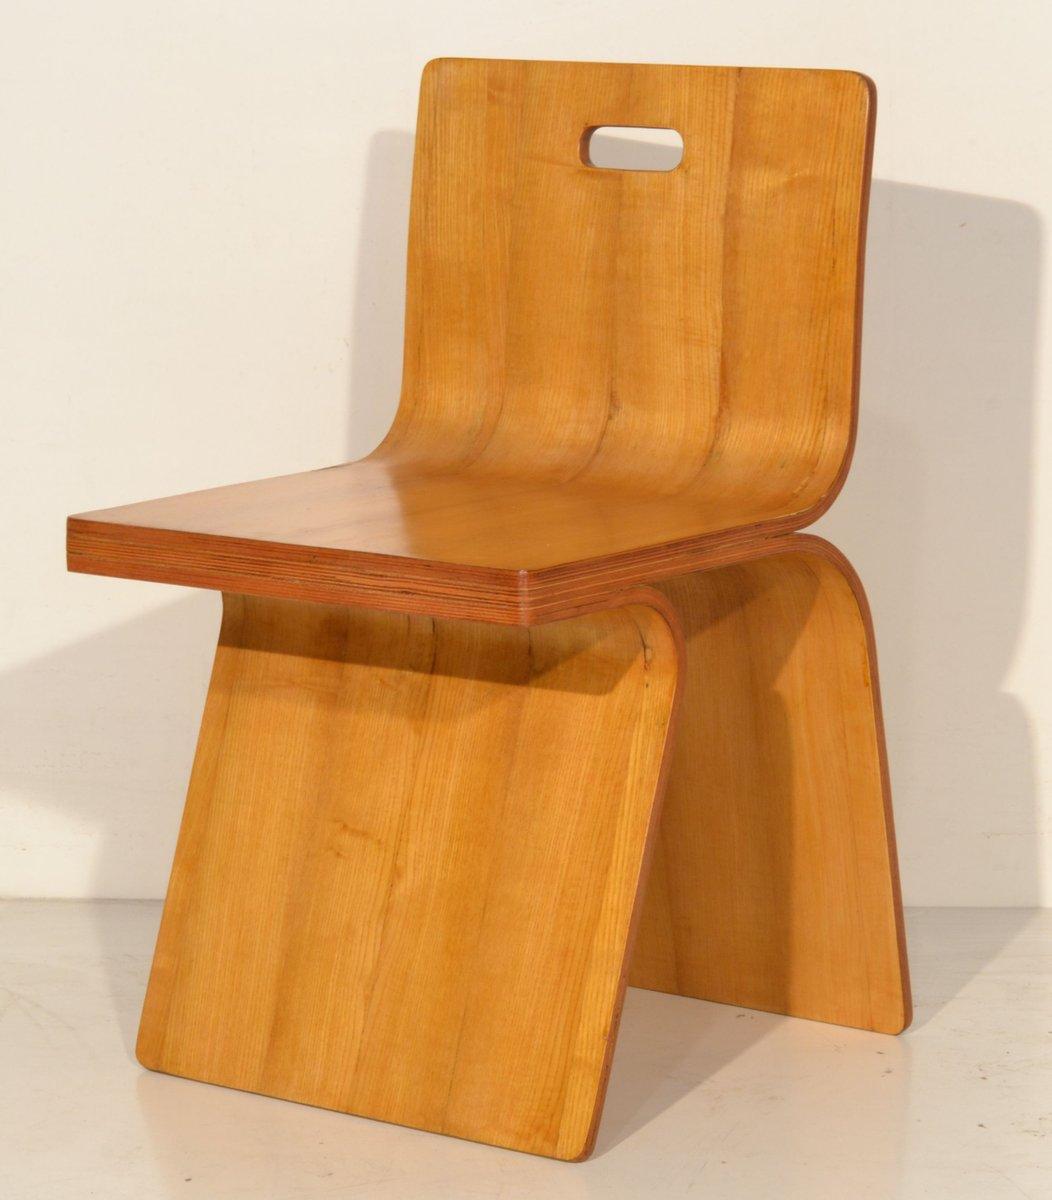 Bent Plywood Chair - Price per set